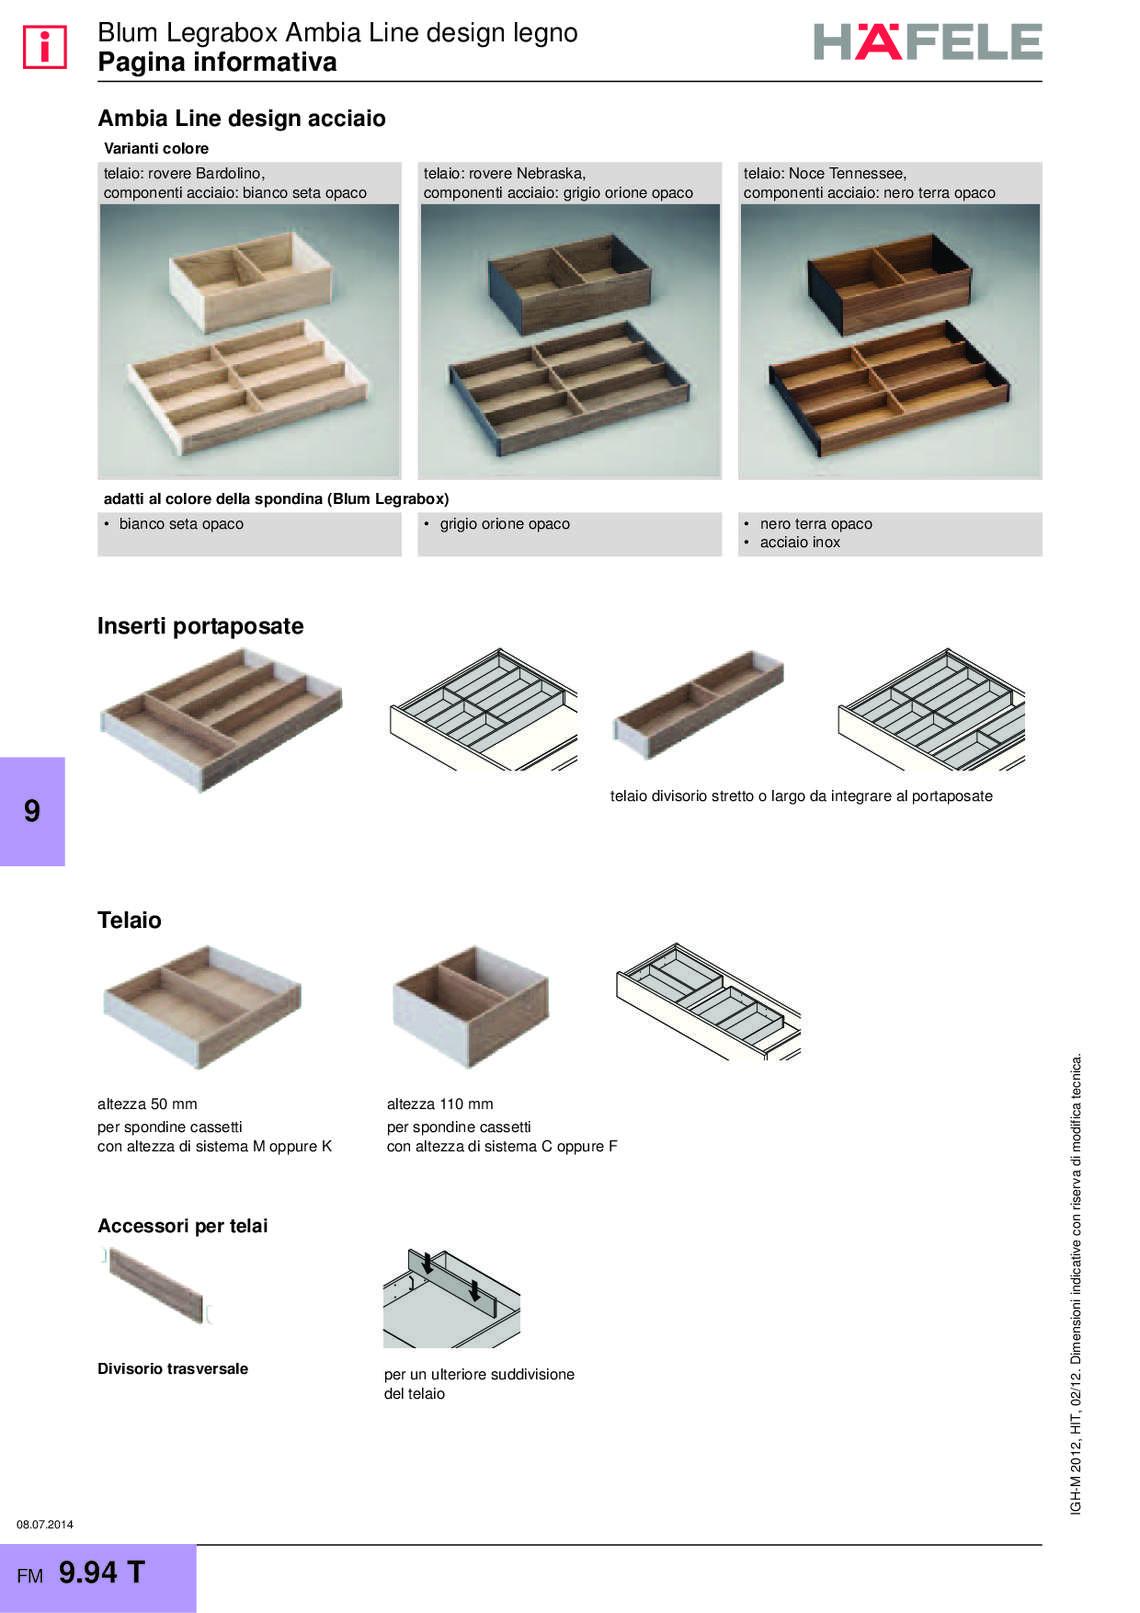 hafele-spondine-e-guide-per-mobili_40_137.jpg